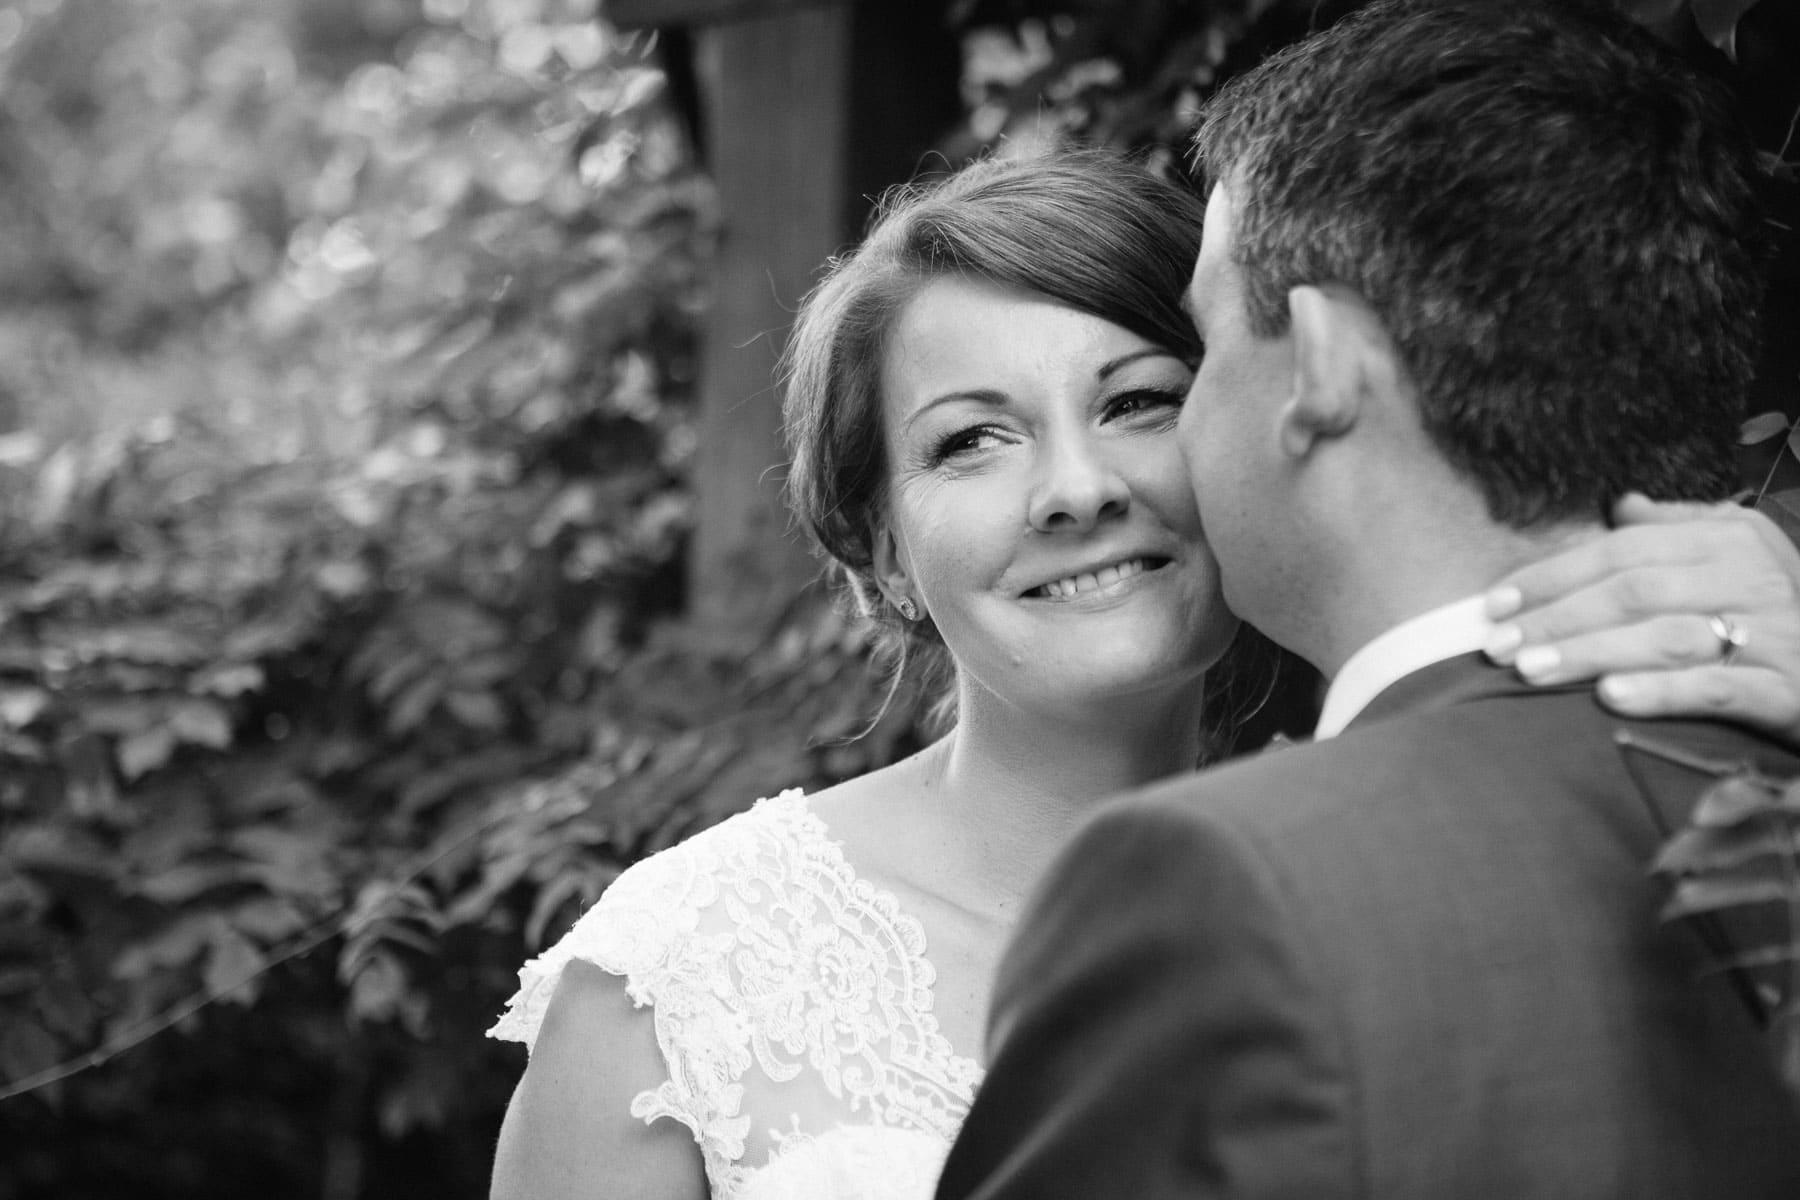 Black and white shot, groom kisses bride on cheek